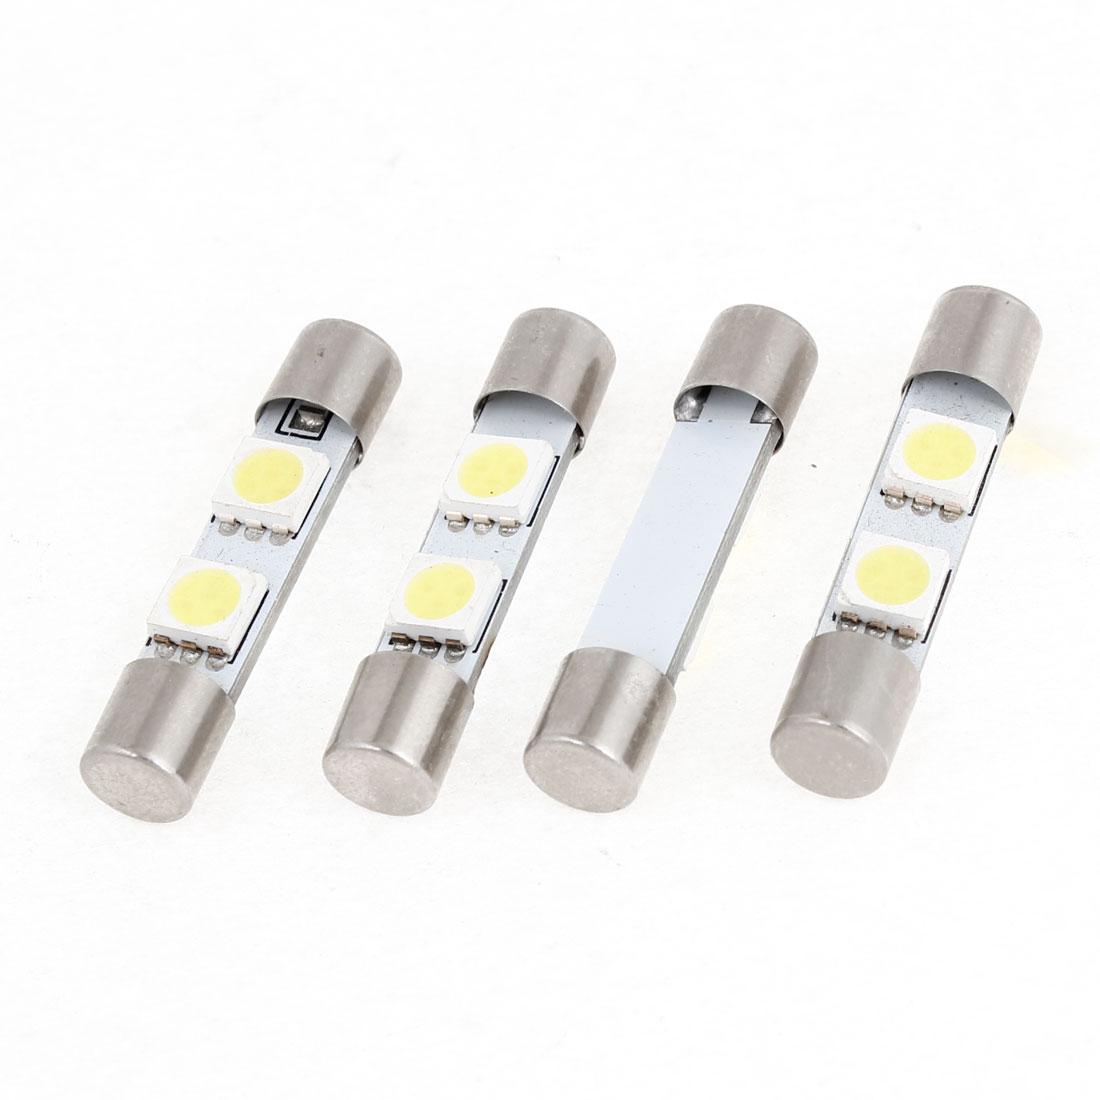 4pcs Car Automobile White 5050 2-SMD LED Festoon Dome Light Lamp Bulb 31mm